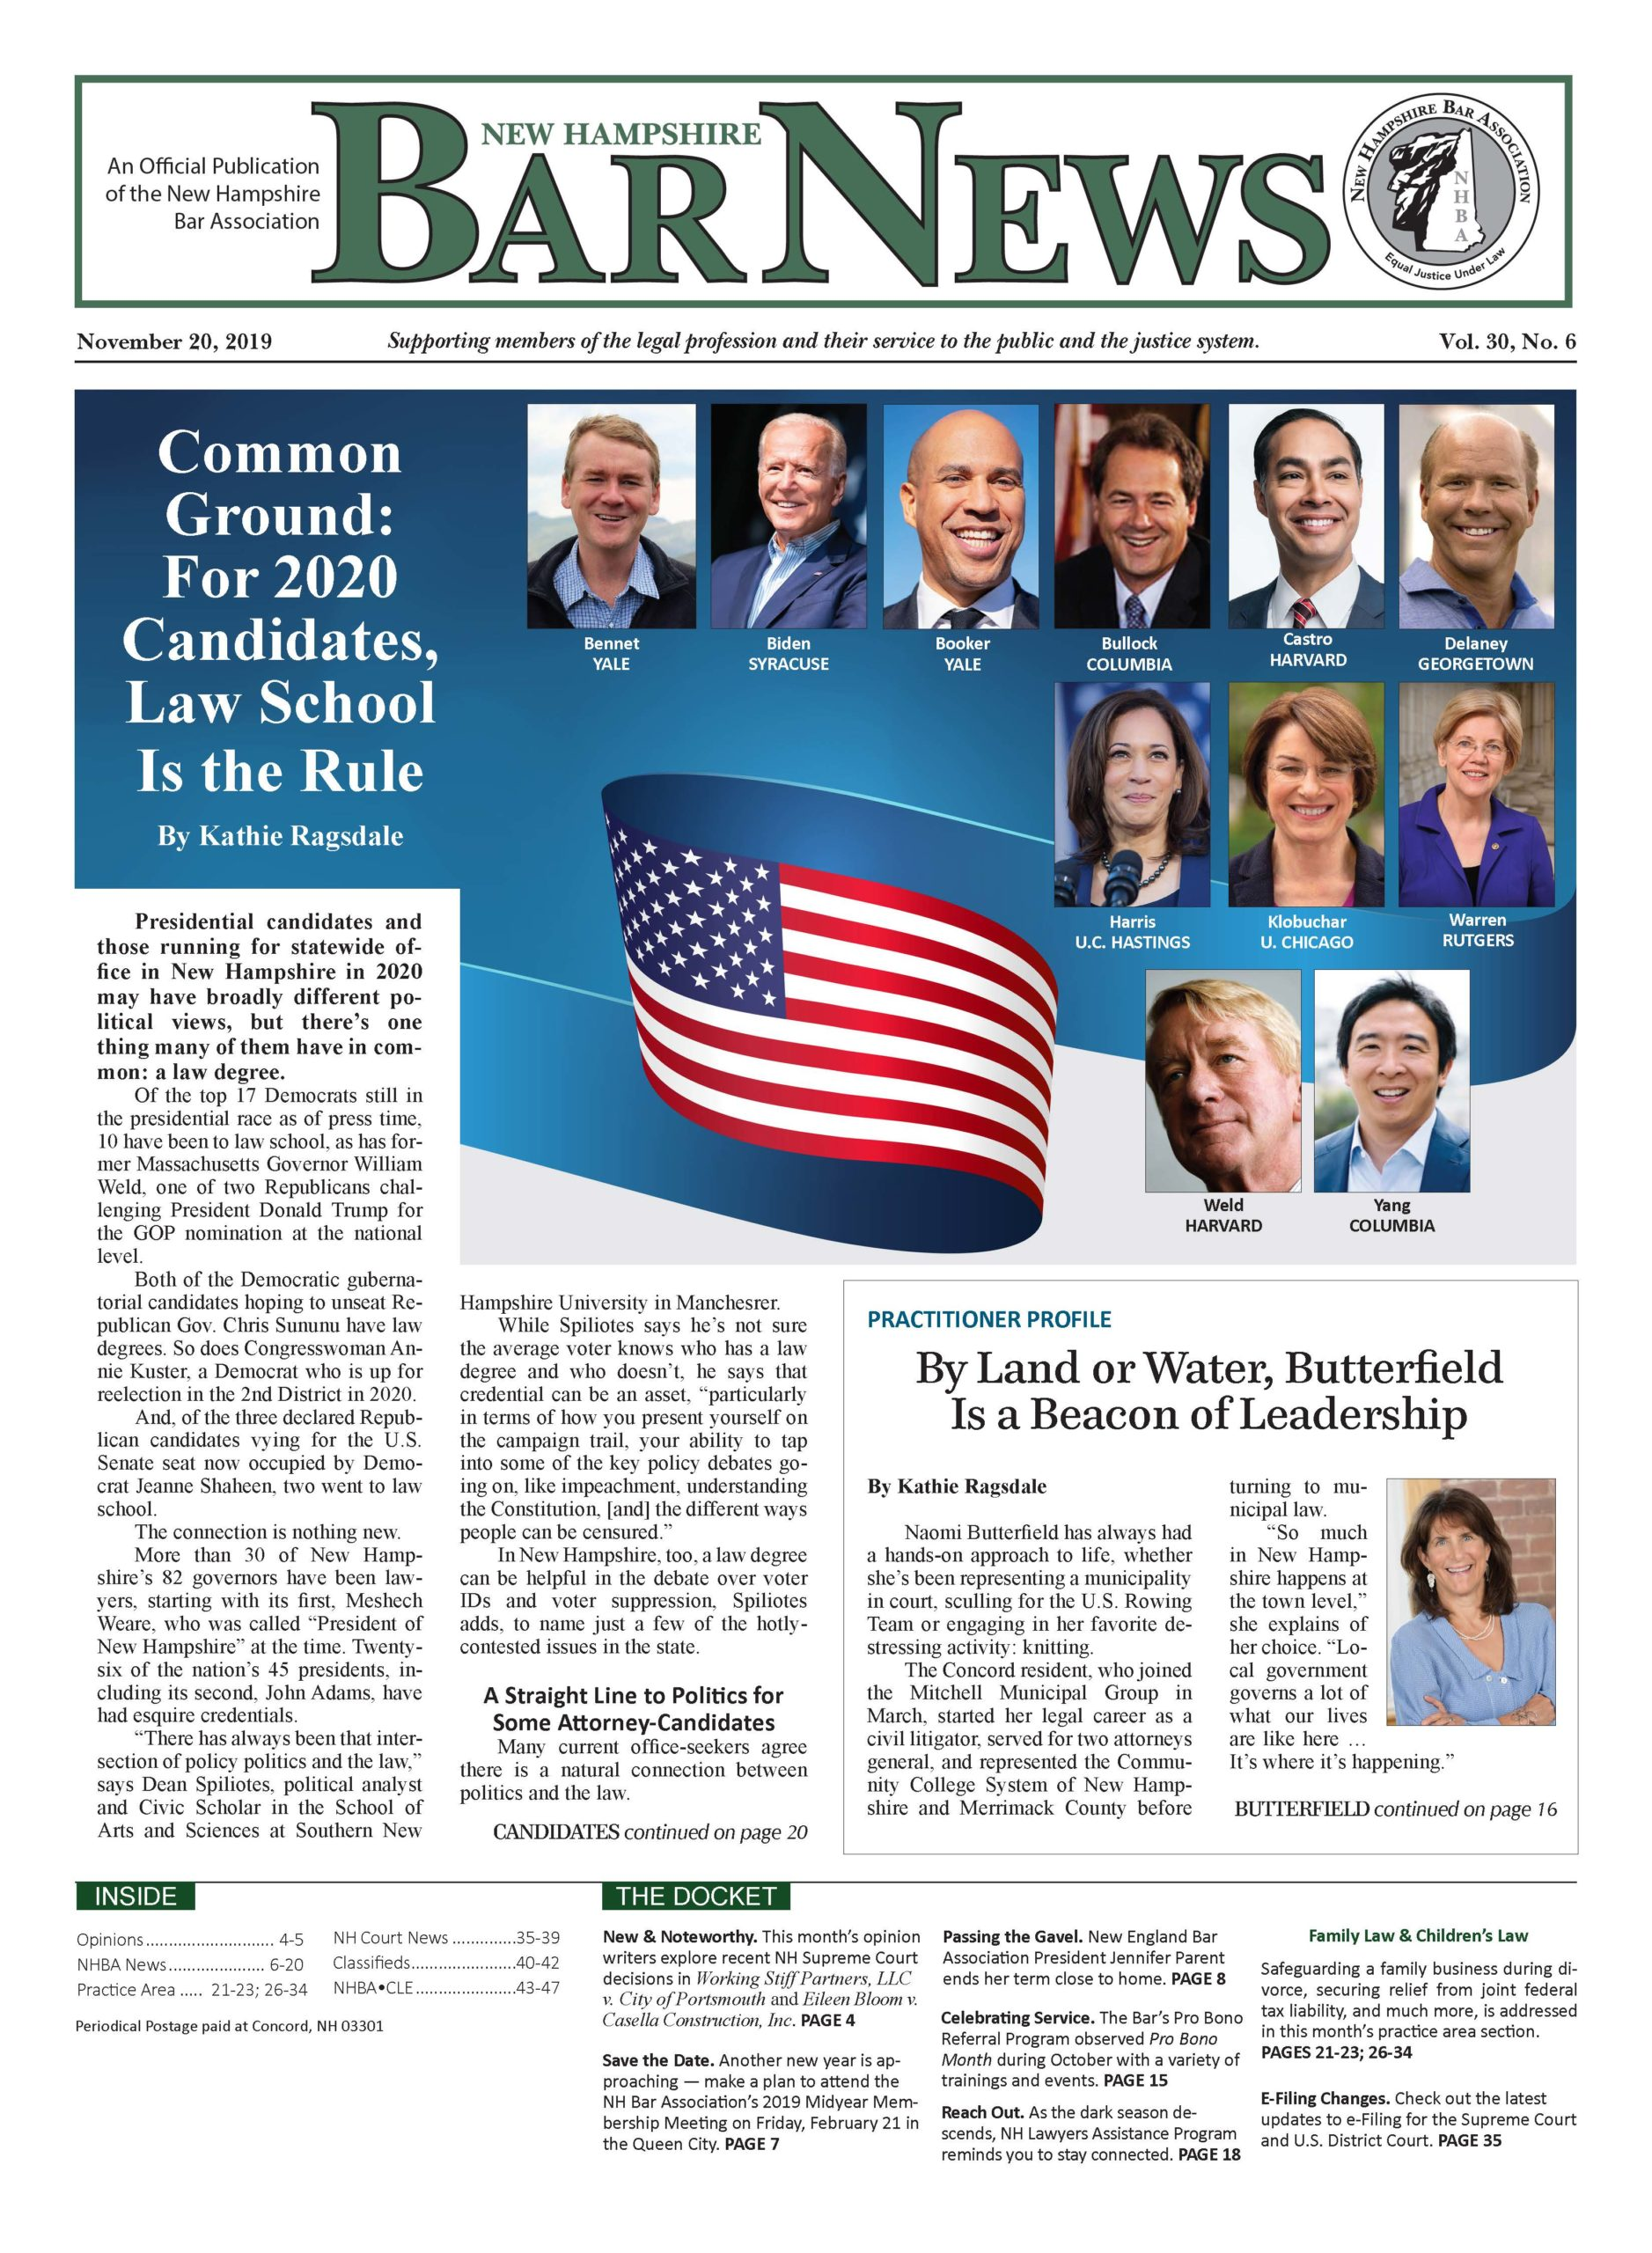 Front page of the NH Bar News November 20, 2019